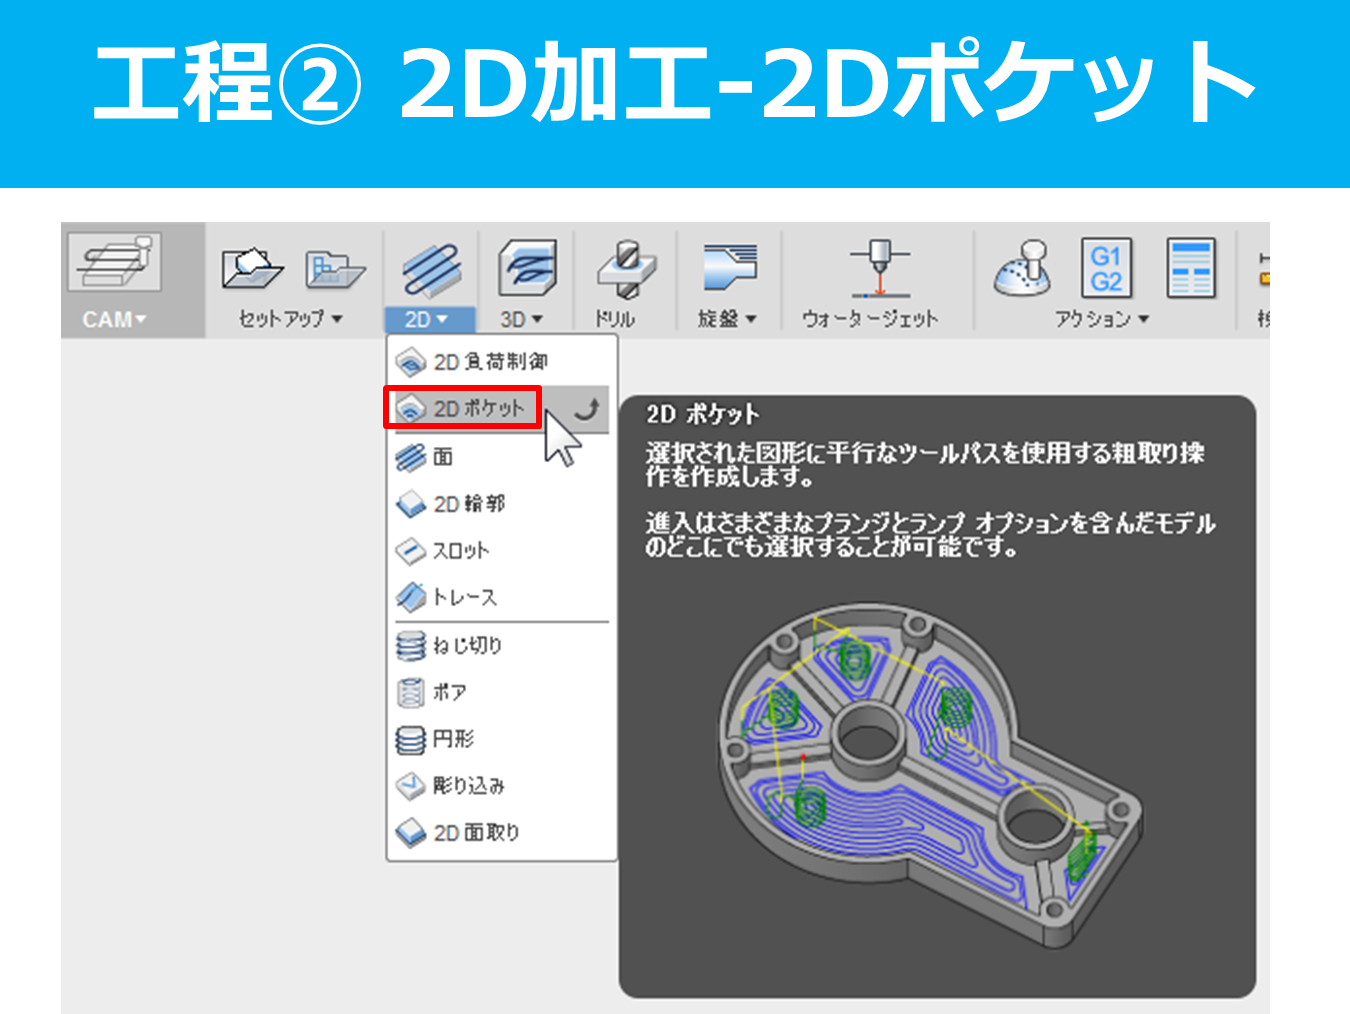 Fusion360 CAM Tutorial 2 「2D加工」 : Home3Ddo 家で気軽に3D